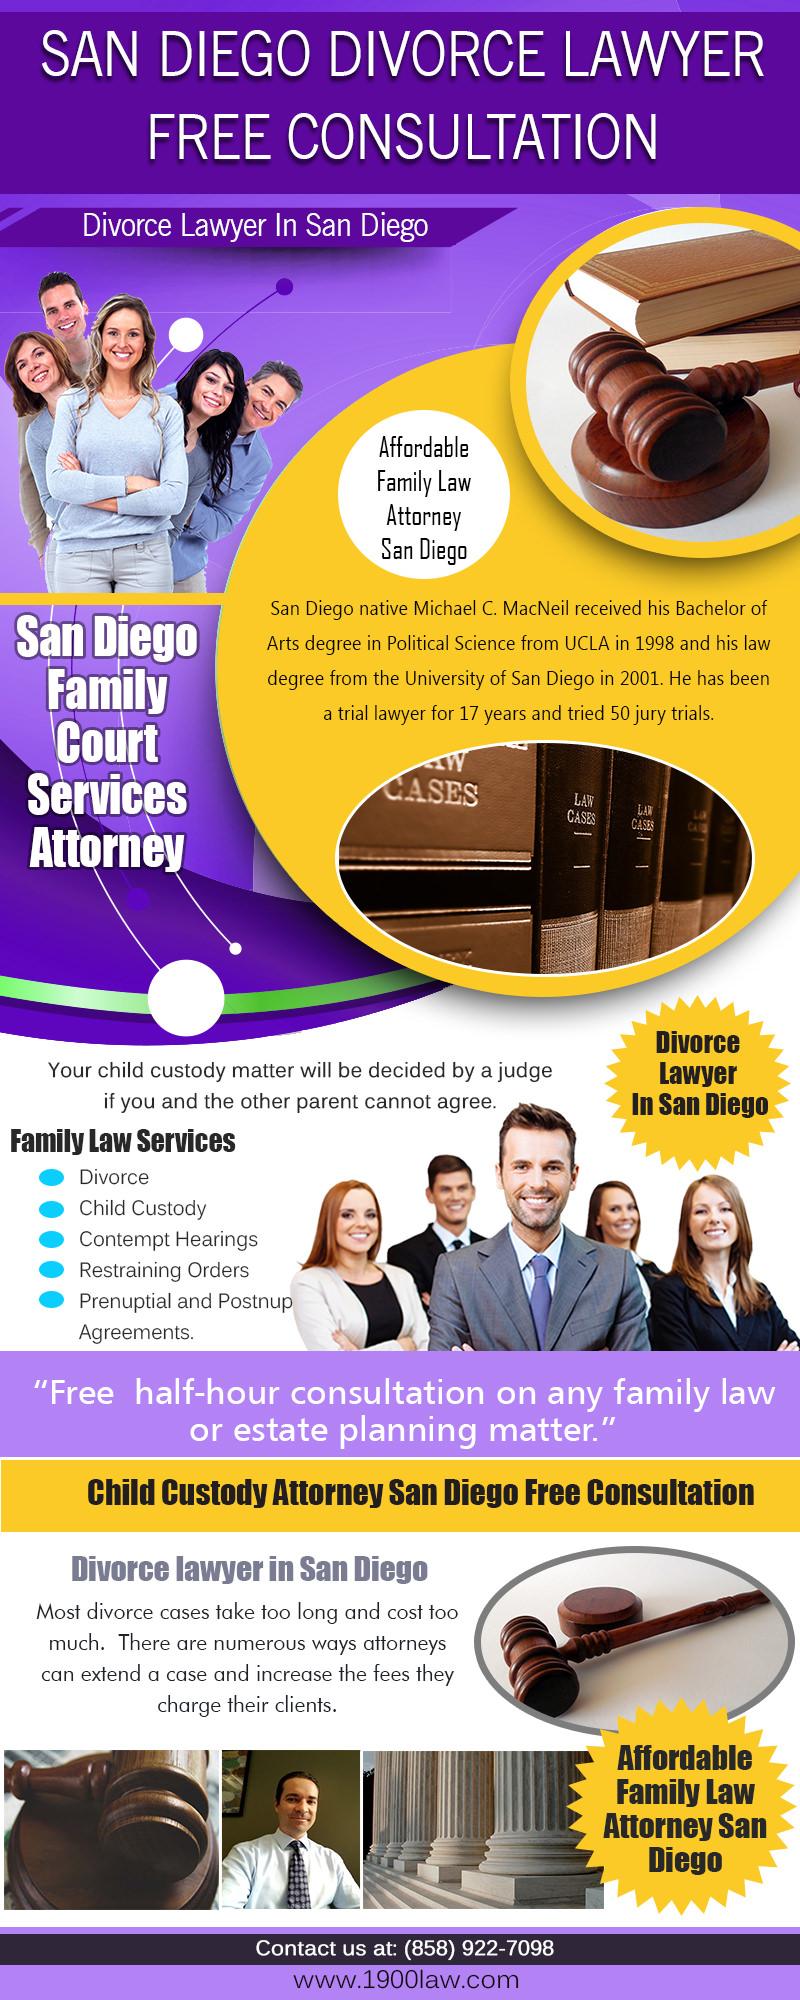 San Diego Divorce Lawyer Free Consultation | (858) 922-7098